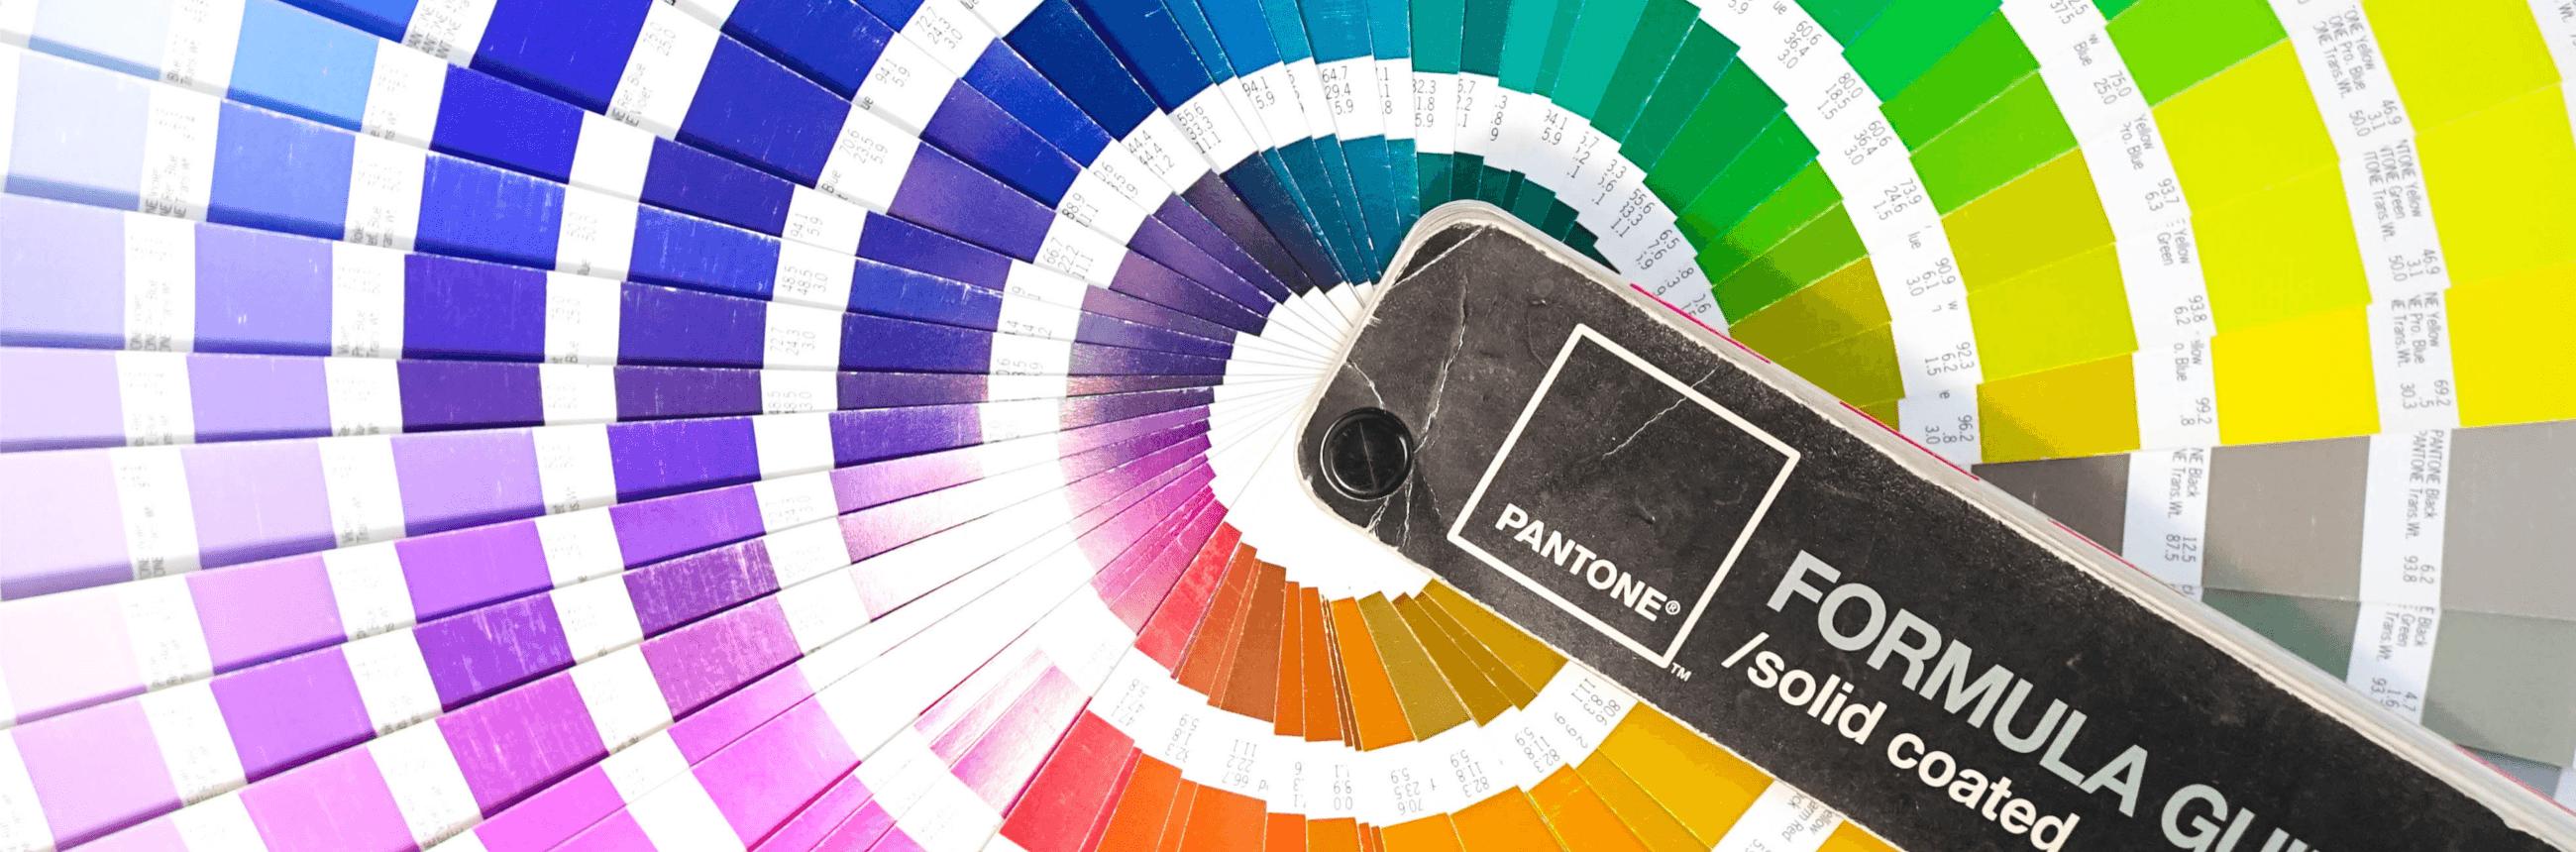 Kleurverschillen RGB, CMYK & PMS